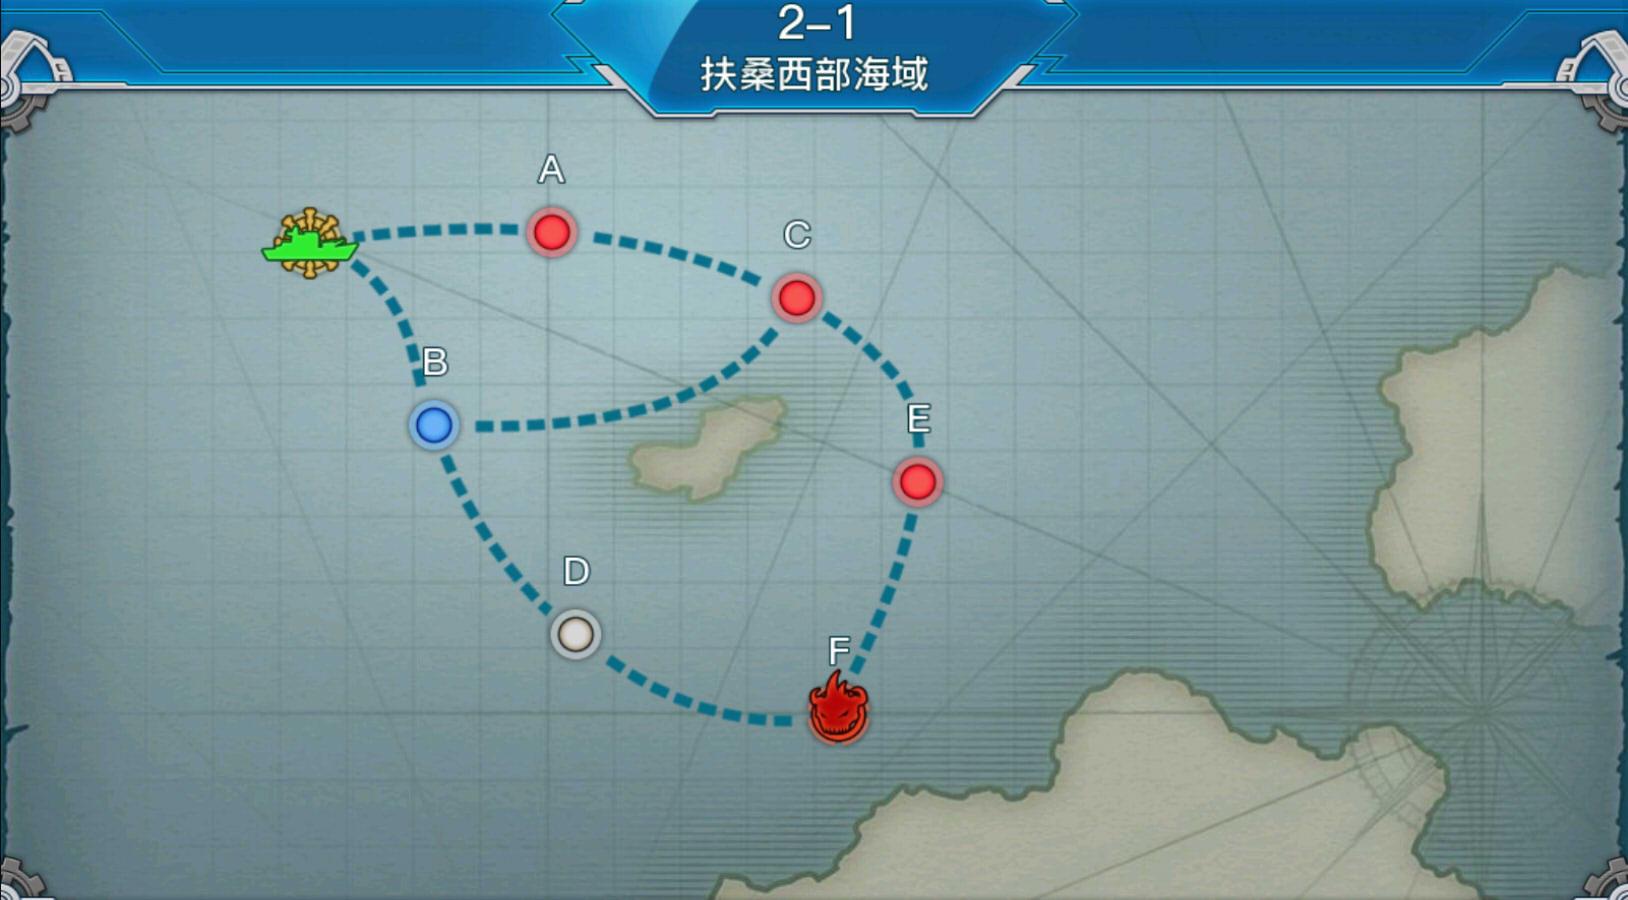 2-1 MAP.jpg